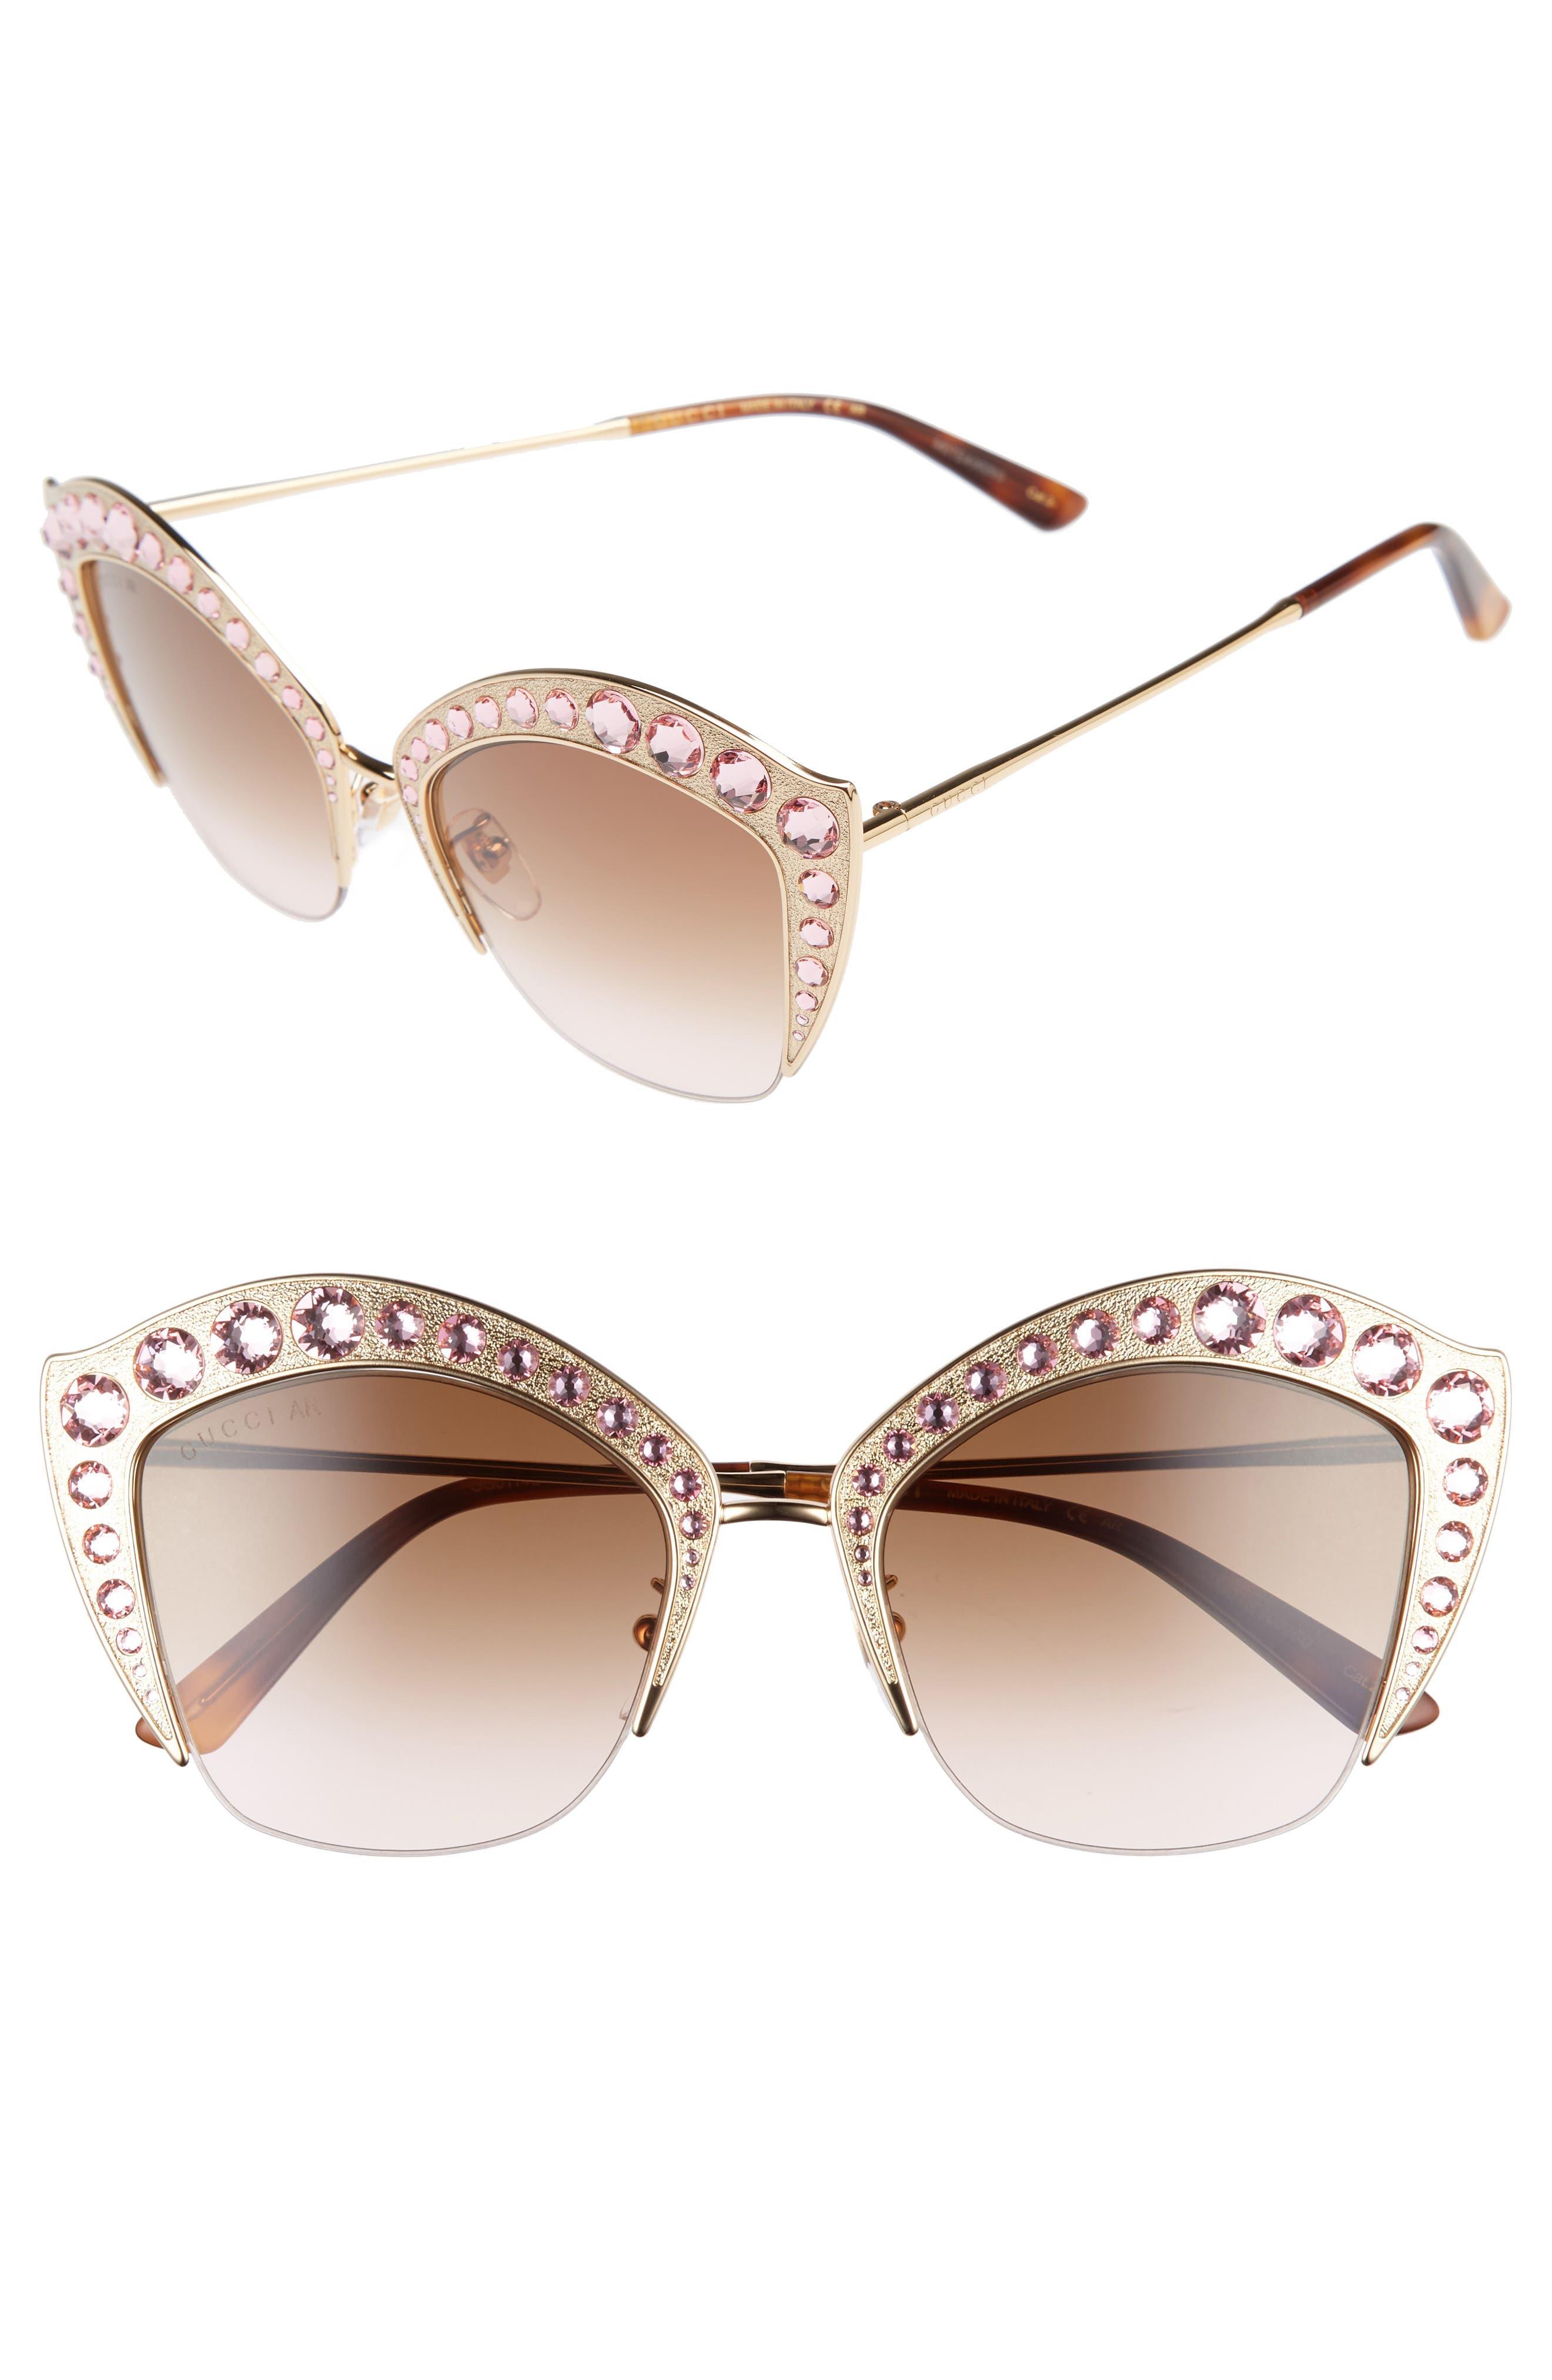 53mm Embellished Cat Eye Sunglasses,                         Main,                         color, 710